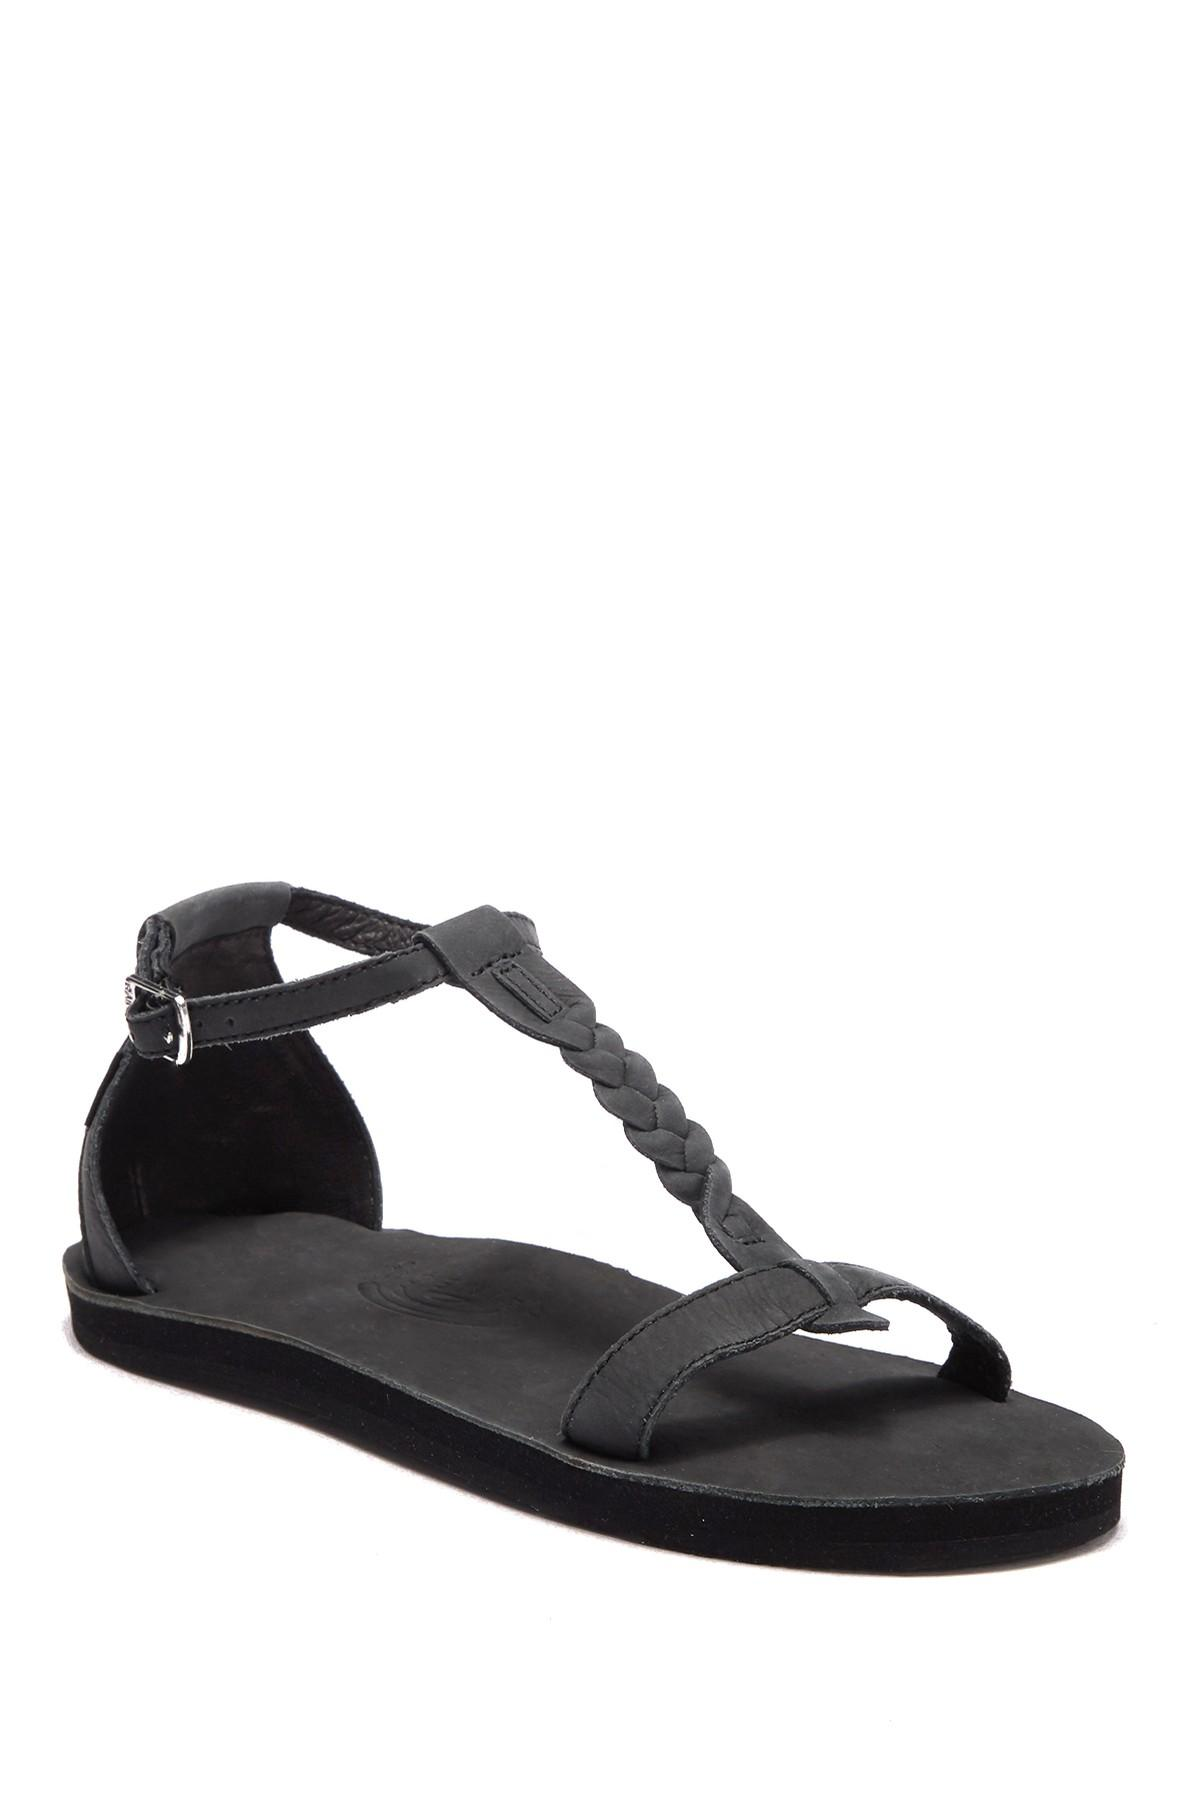 de3cb824cdb Lyst - Rainbow Sandals Calafia Single Layer Center Braid Heel in Black